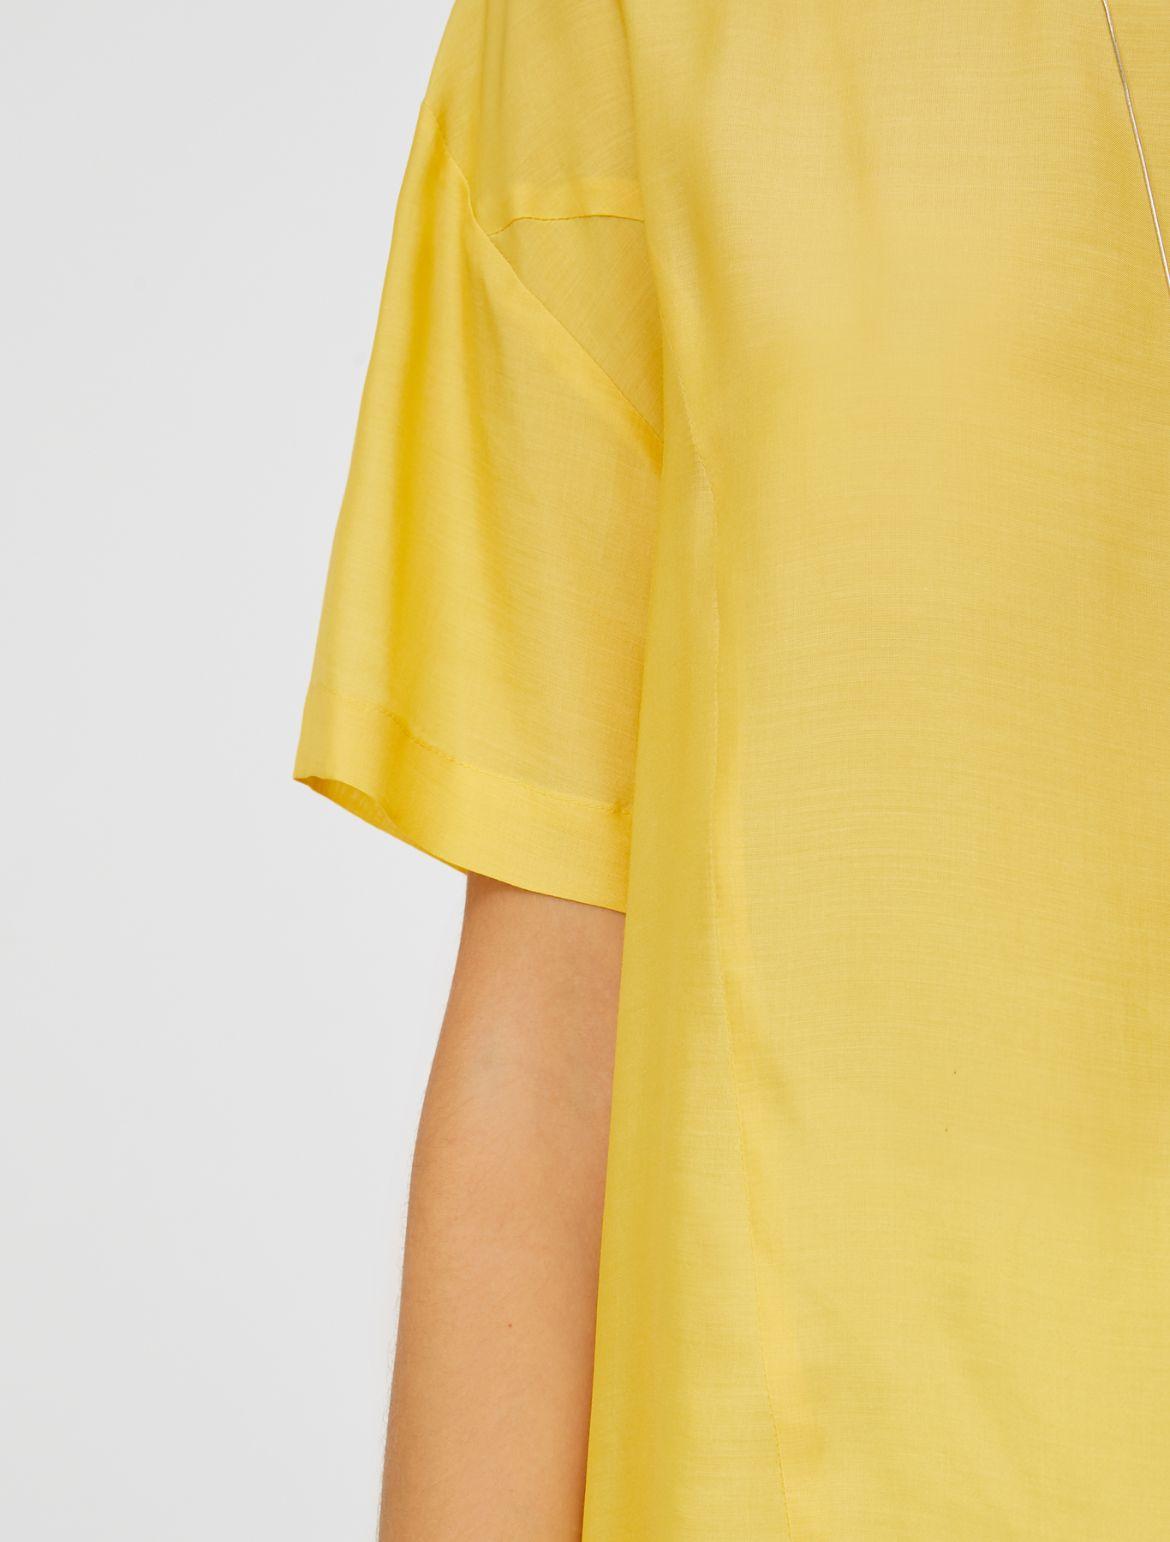 DISPENSA Shirt sunshine yellow 3